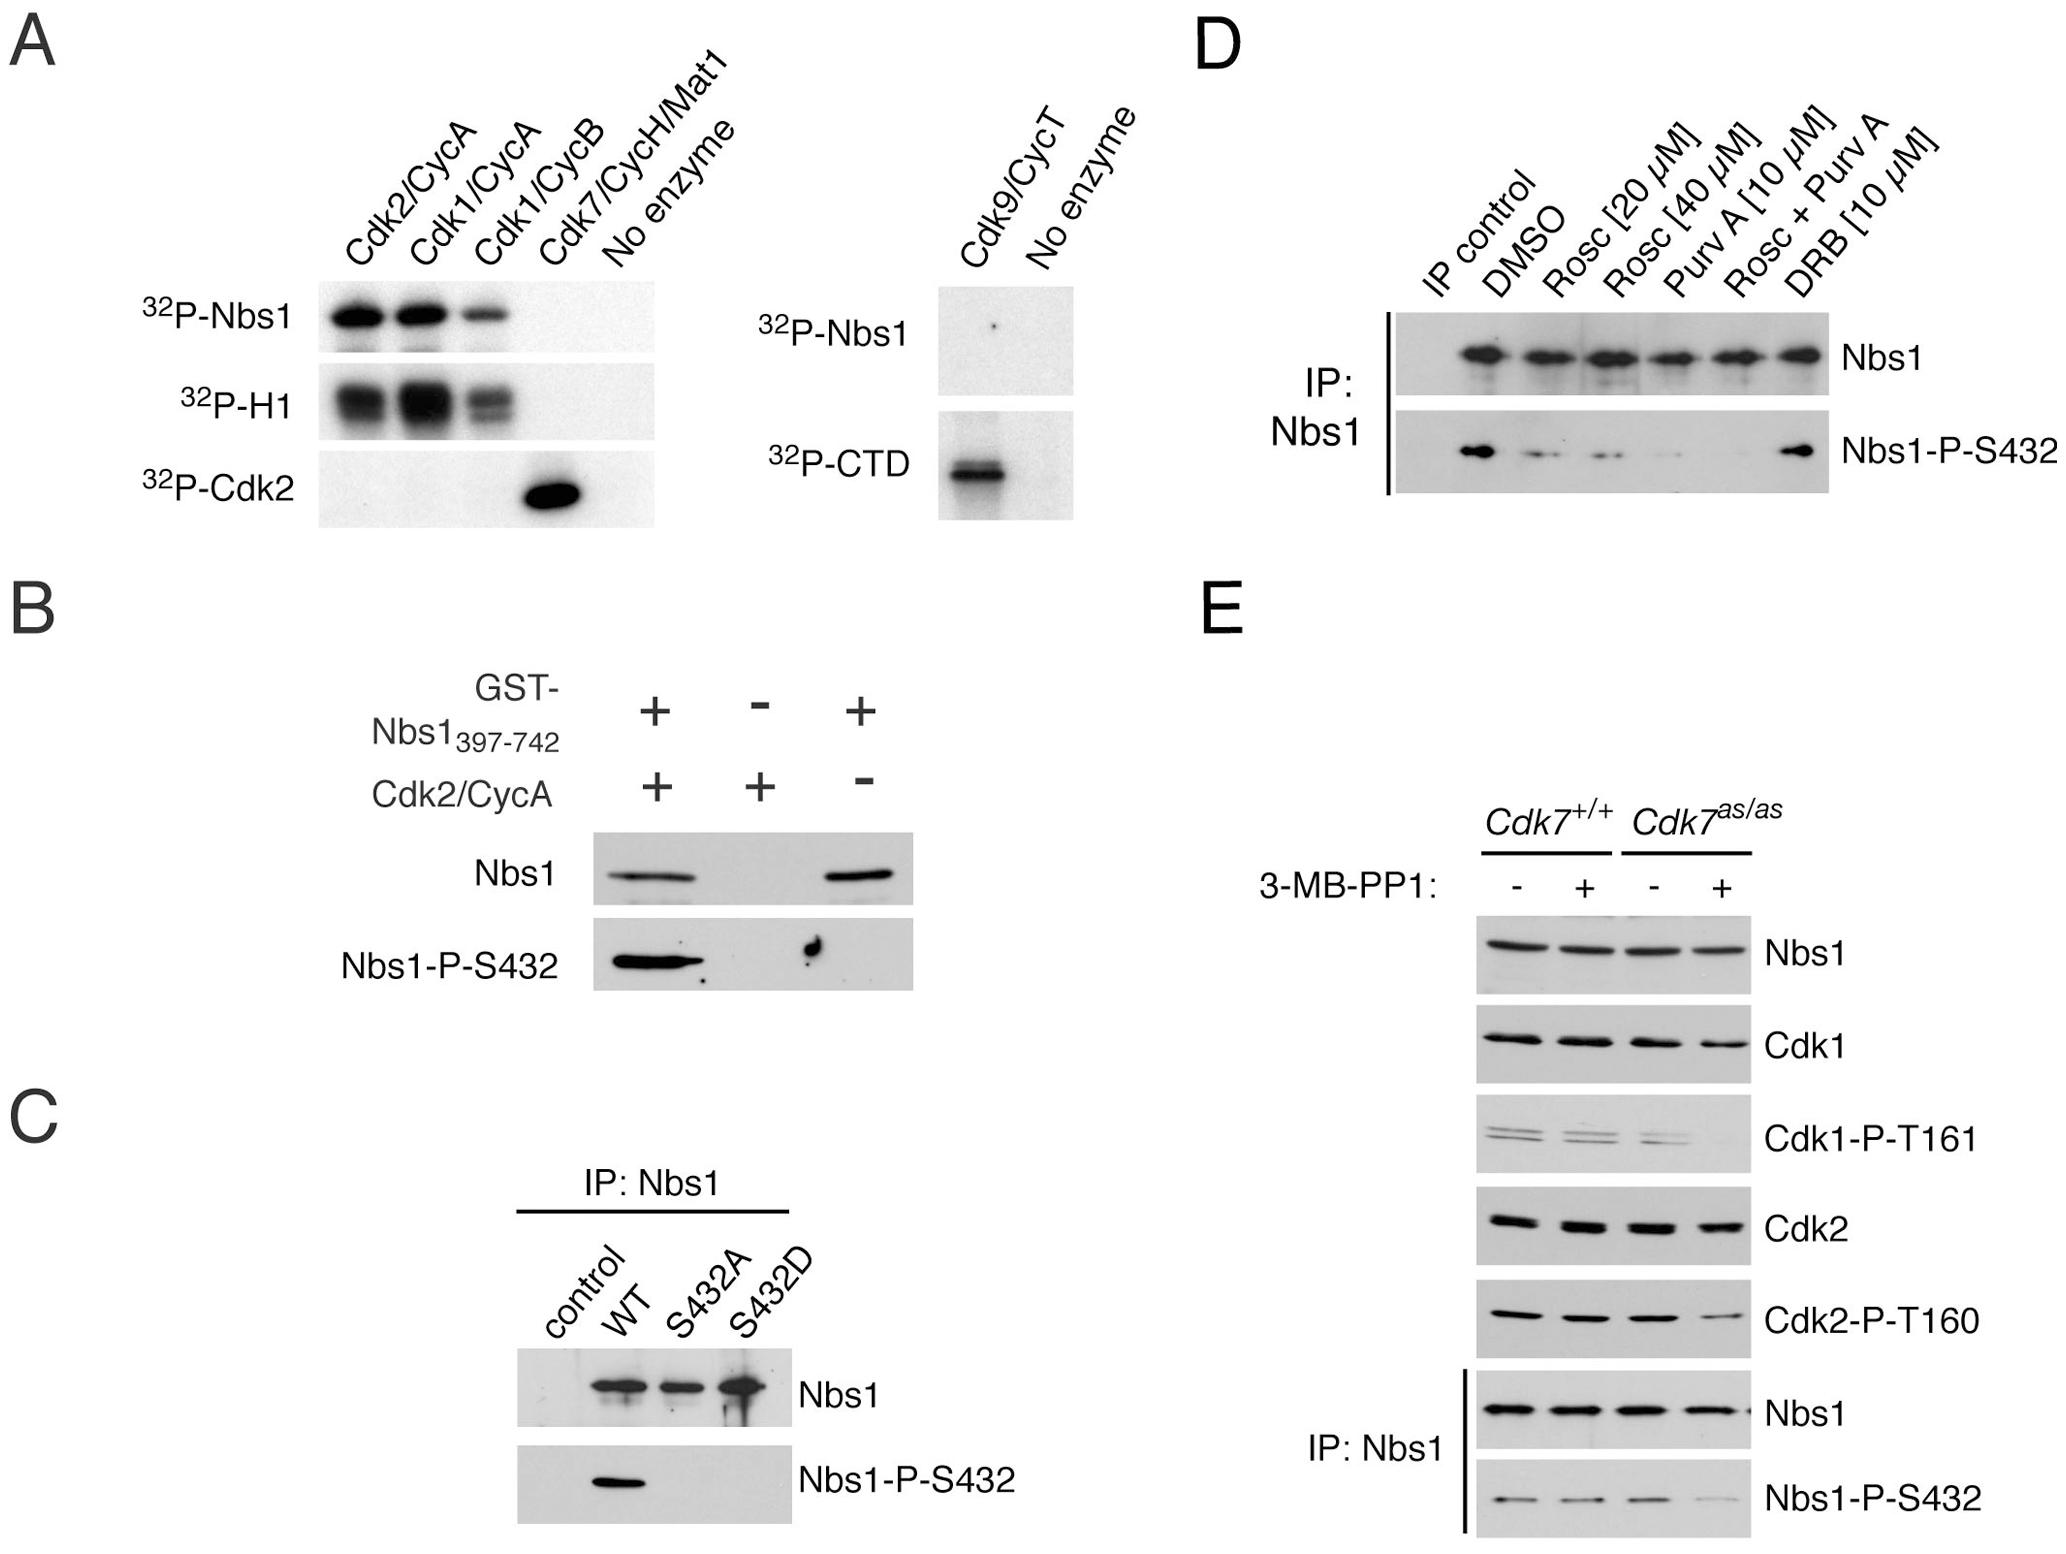 CDKs phosphorylate Nbs1 on Ser432 in vitro and in vivo.